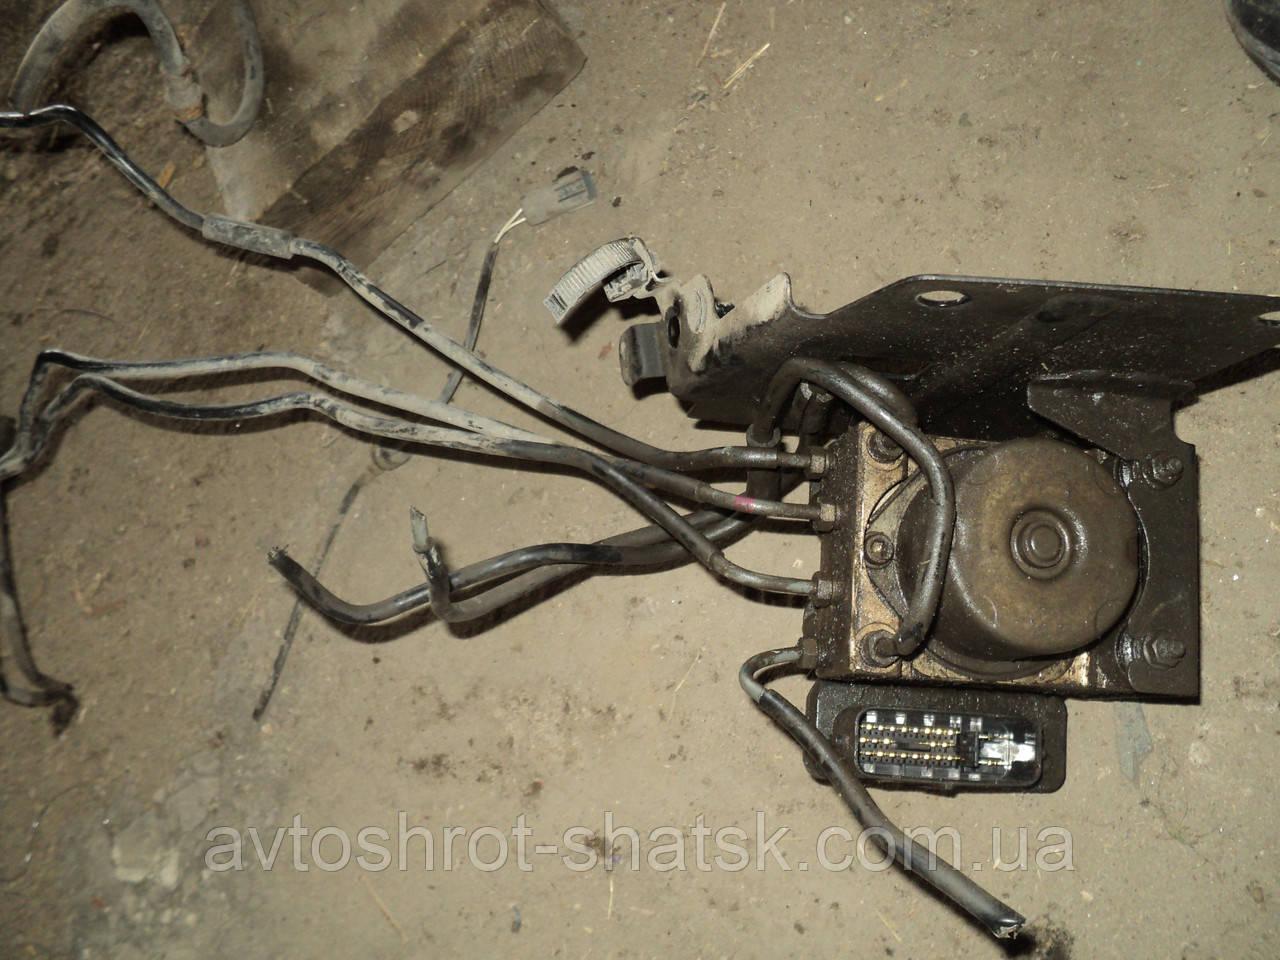 Б/в абс і датчики для Mazda 323F